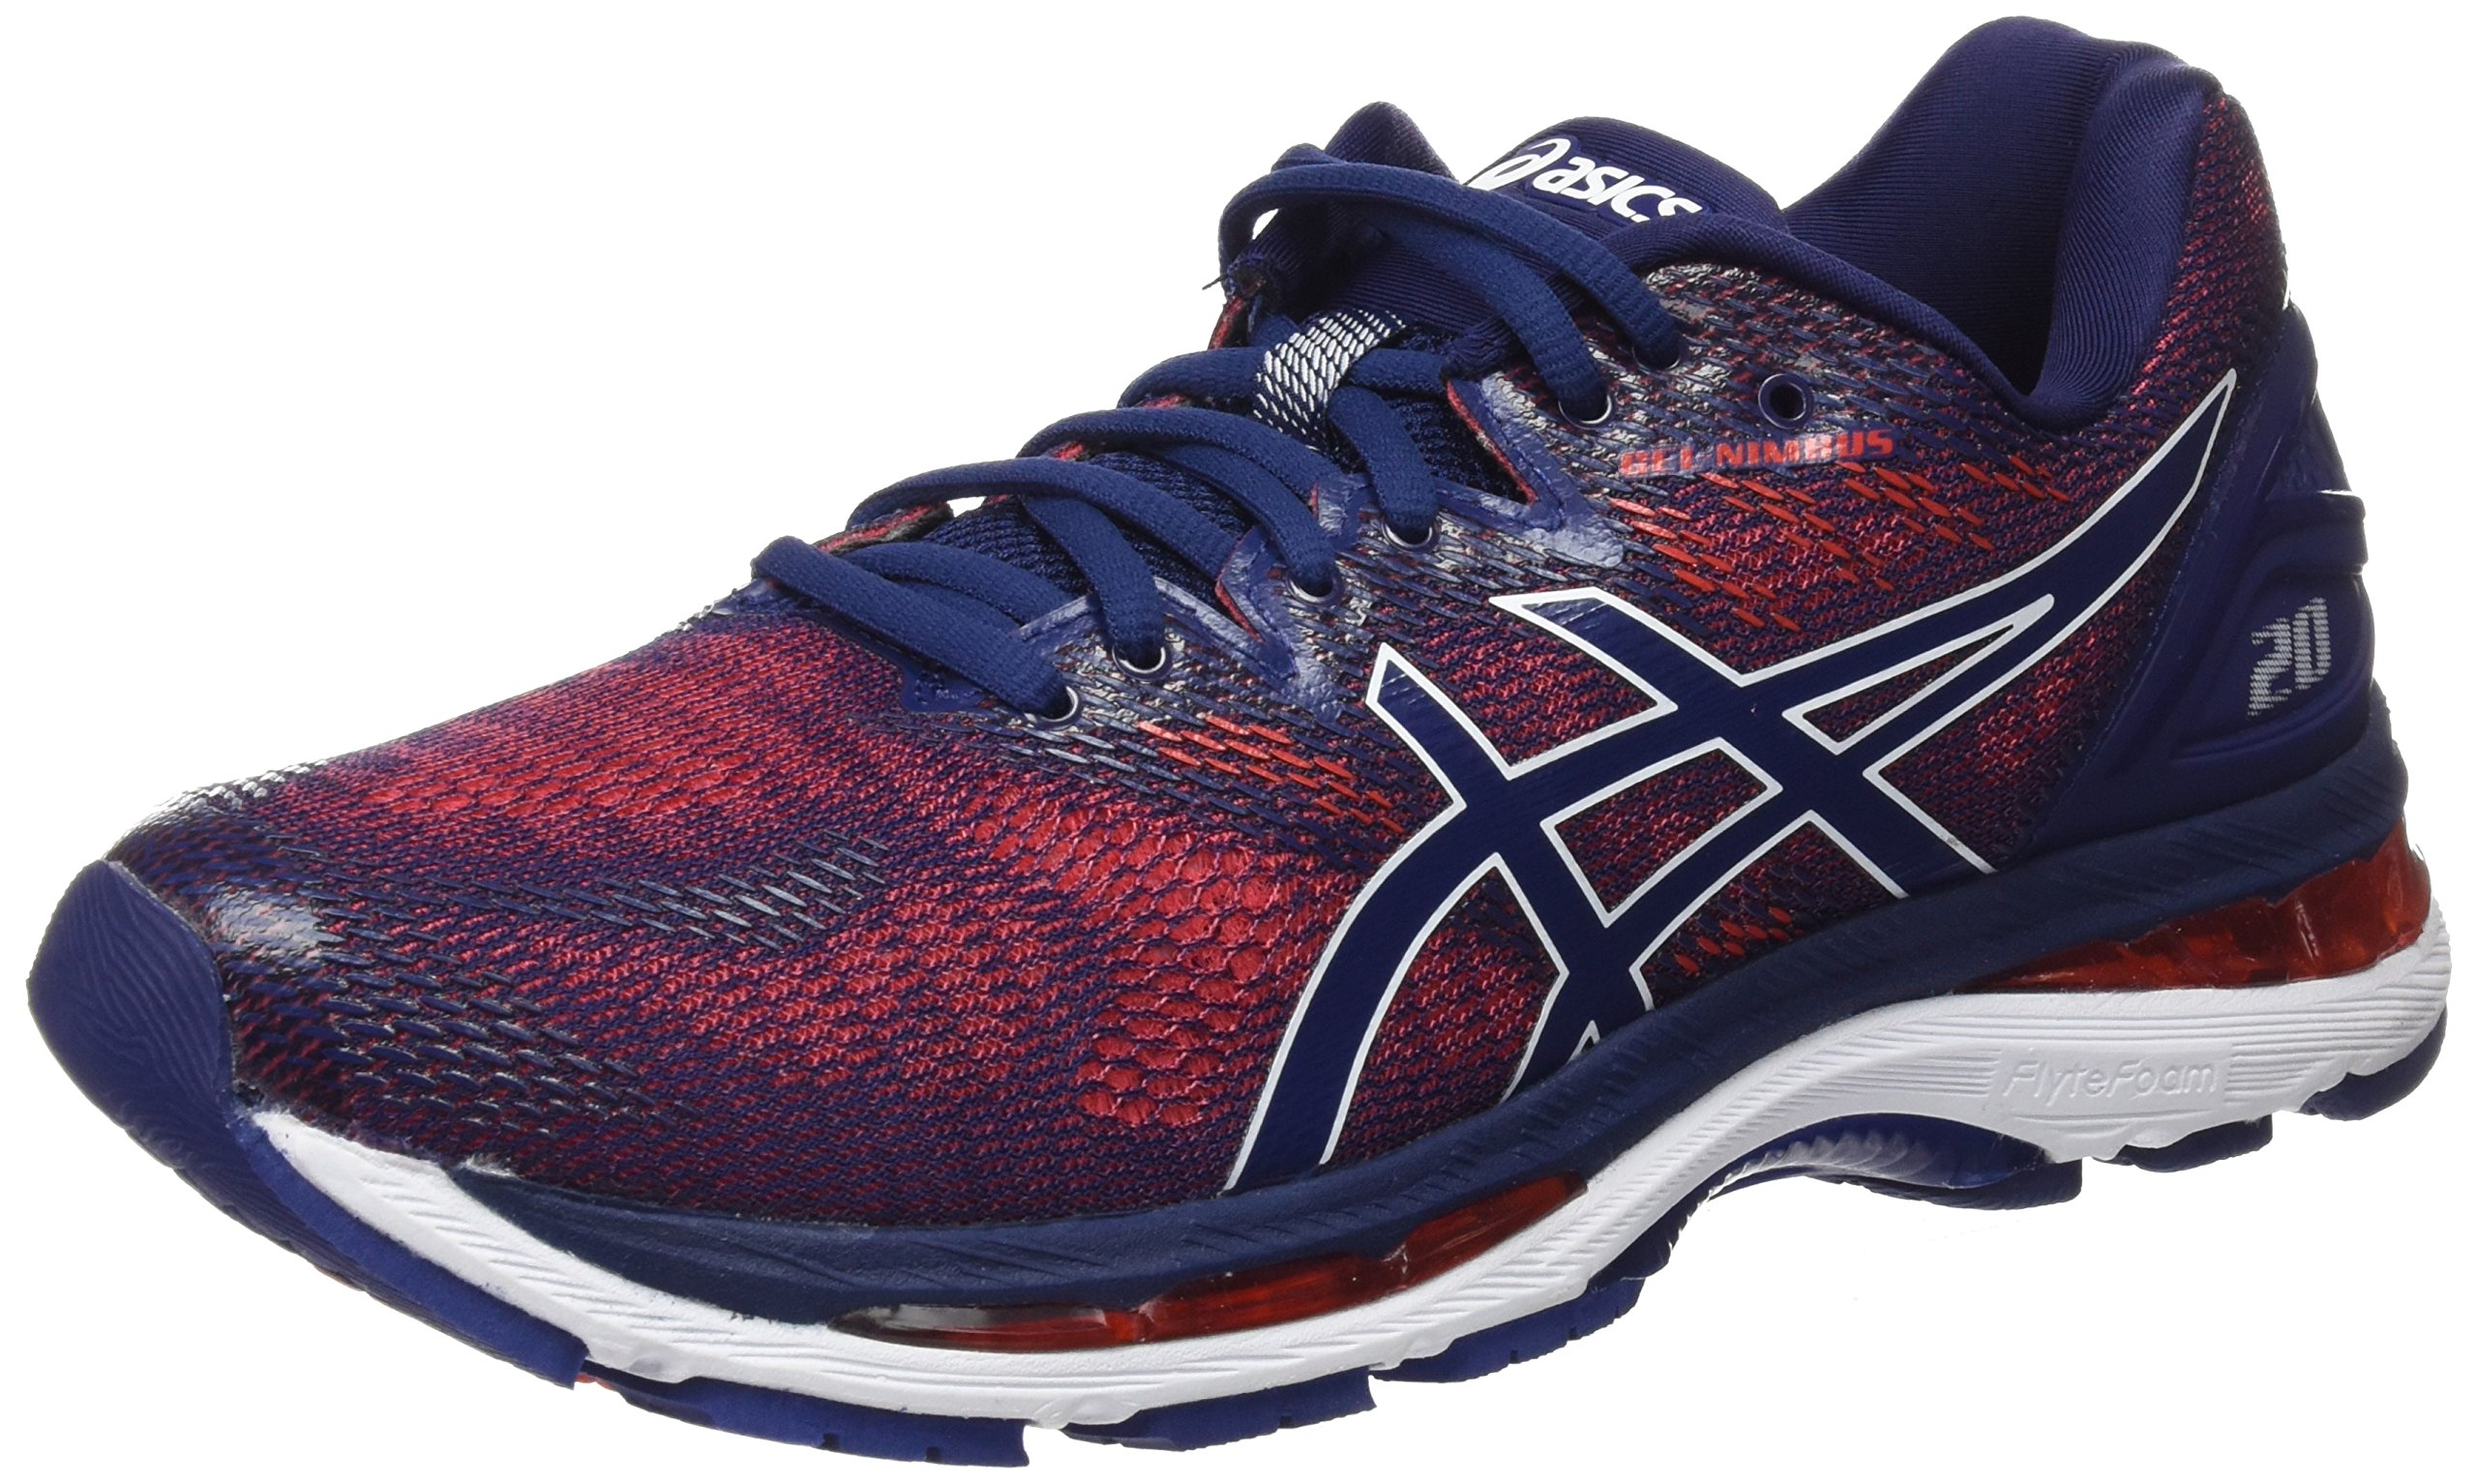 Asics Gel-Nimbus 20 Men's Running Shoes